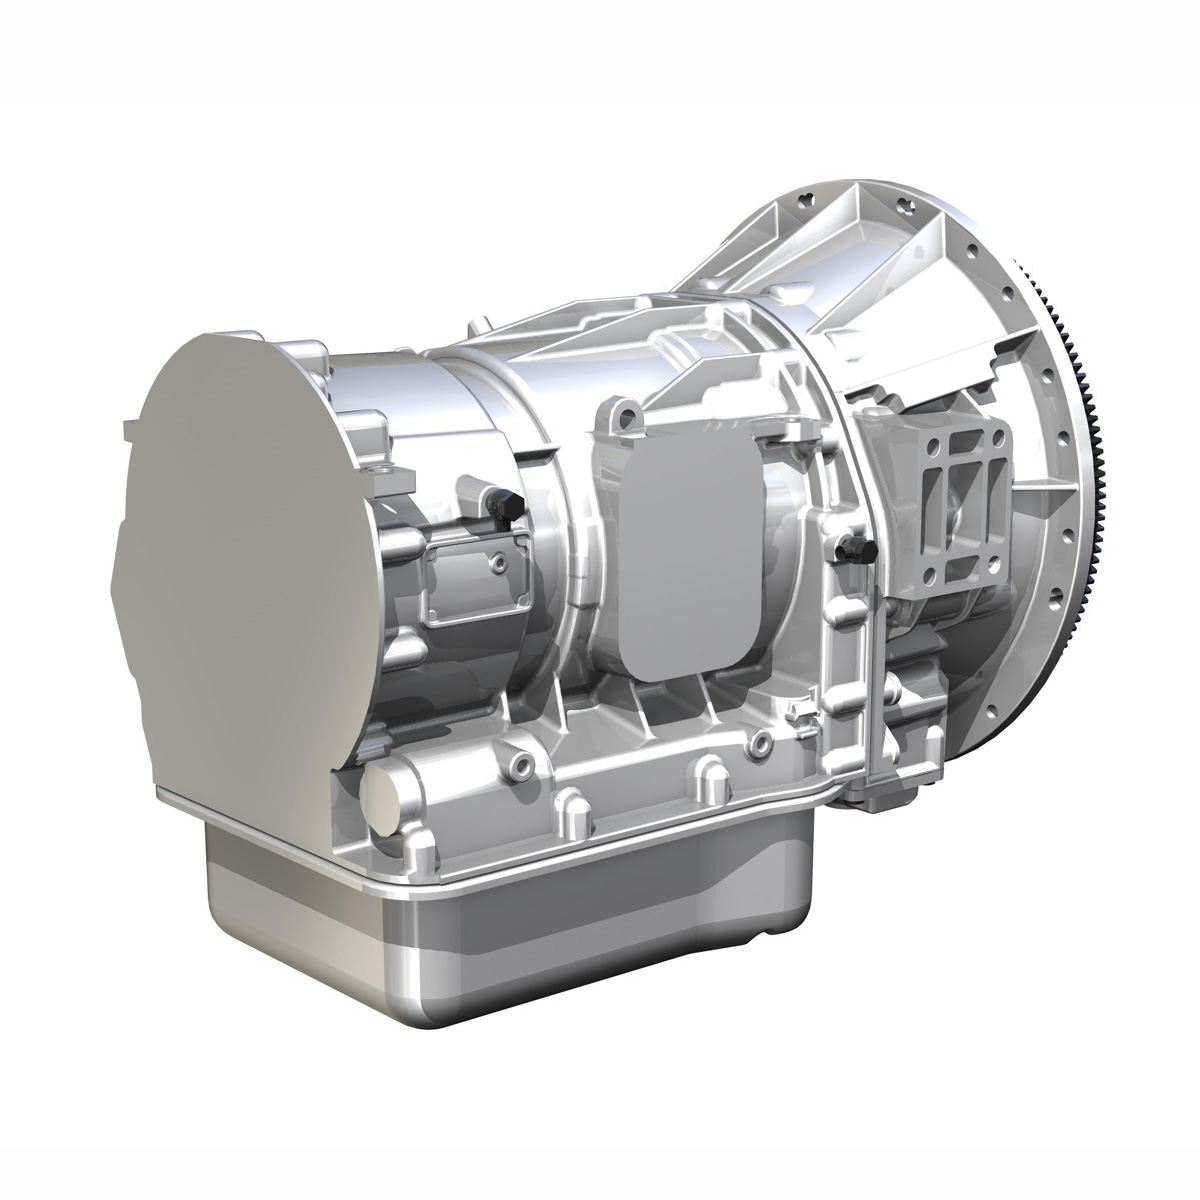 gearing – transmission 3d model 3ds fbx c4d lwo obj 189231